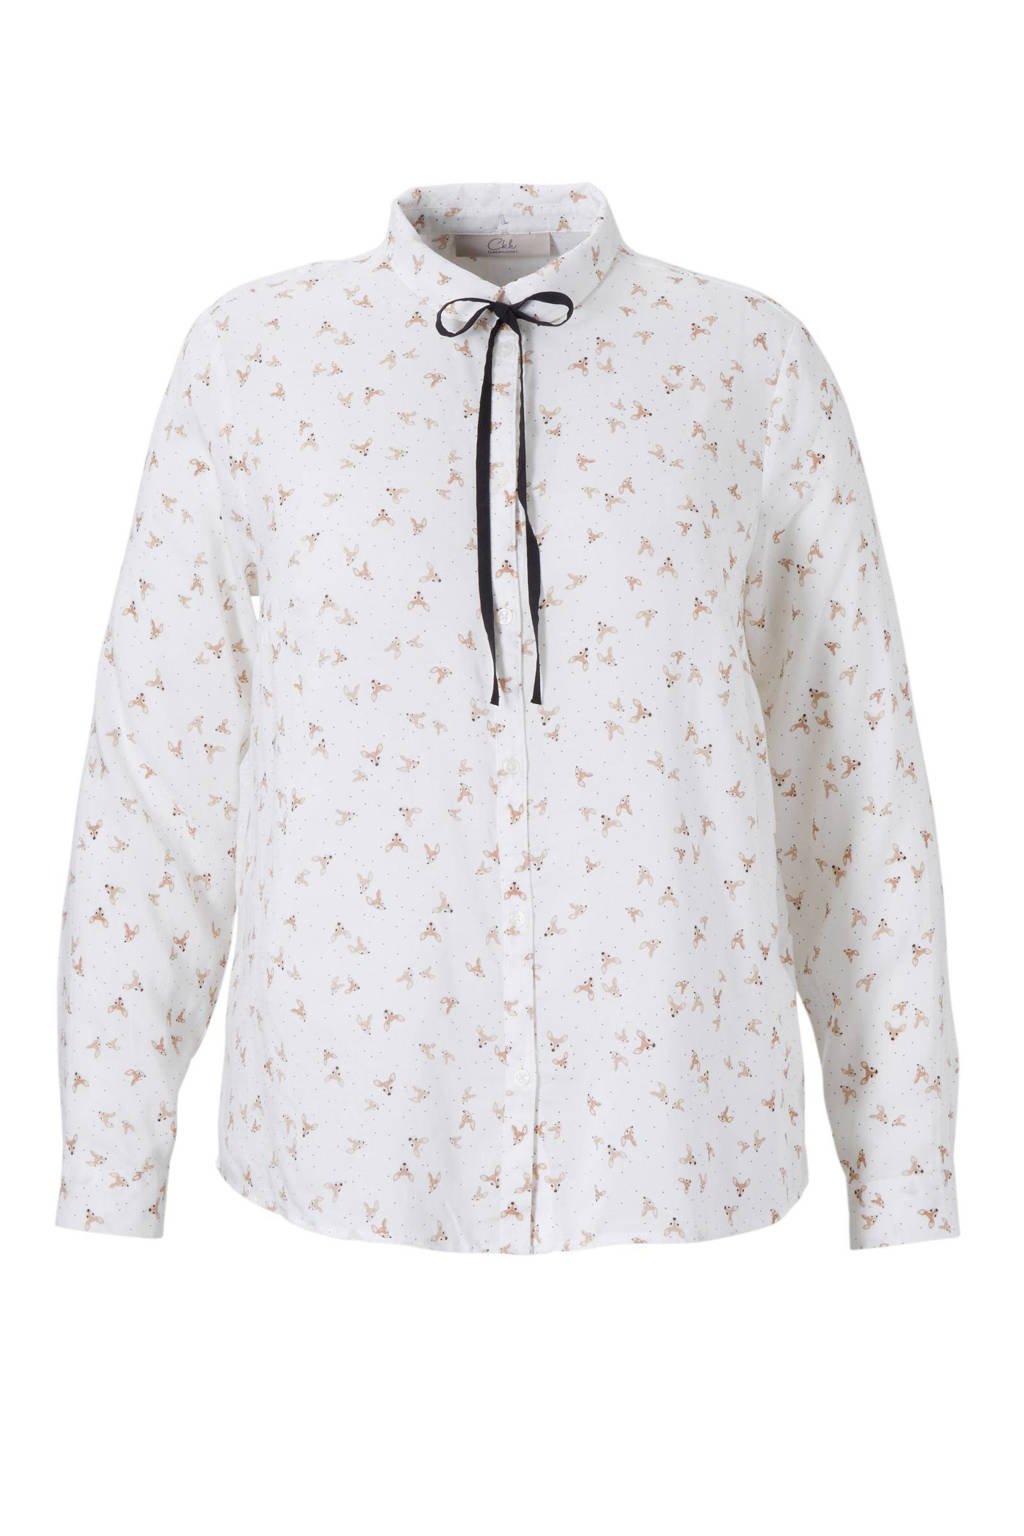 C&A XL Clockhouse blouse, Ecru